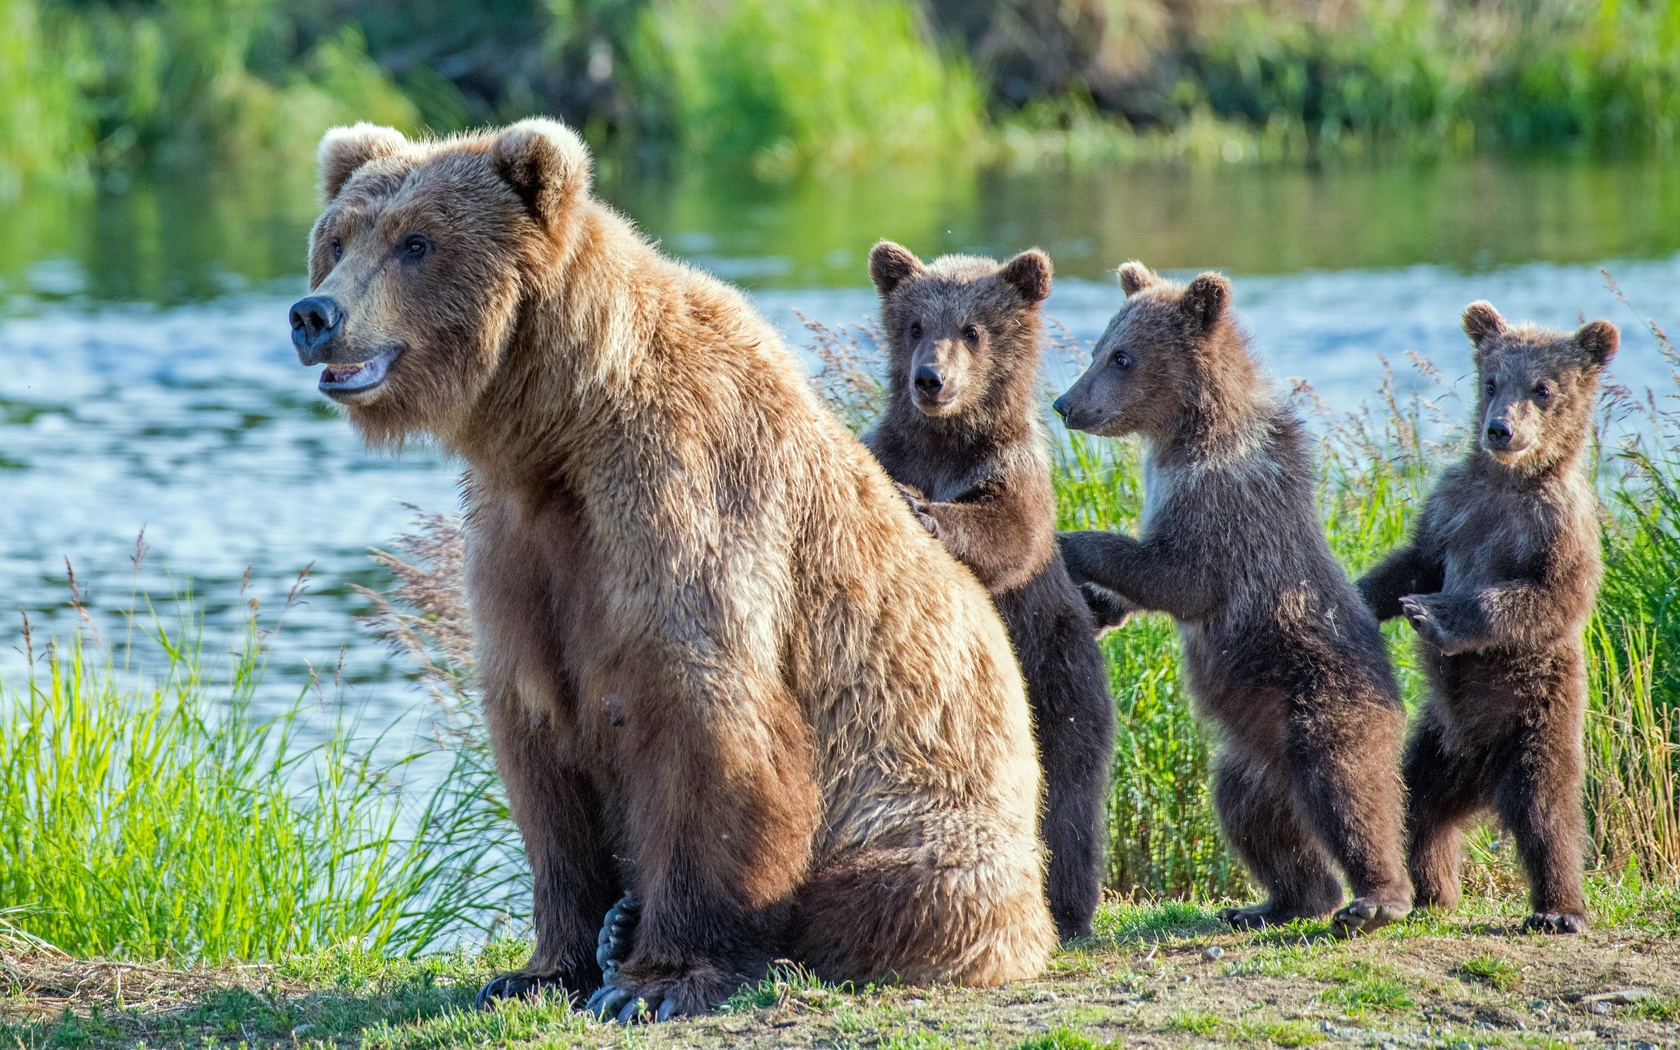 животное, бурая медведица, лес, медвежата, детёныши